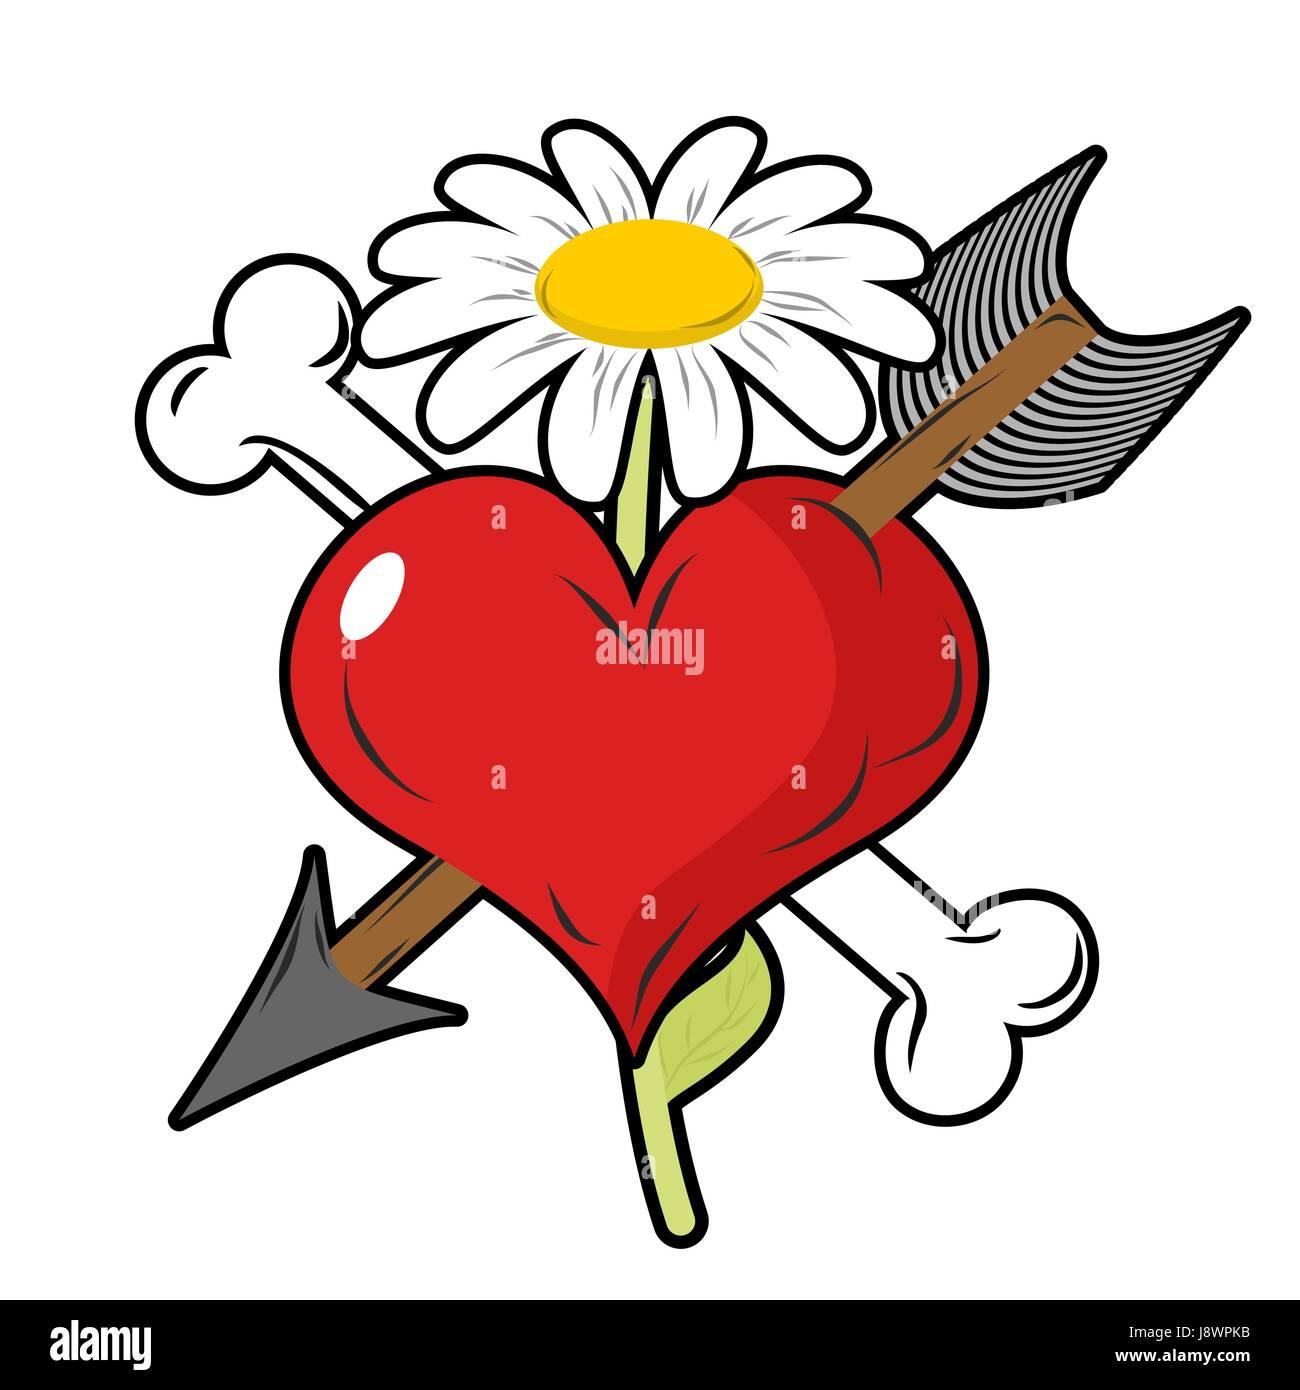 Cupid shooting love arrow vector stock photos cupid shooting love red heart piercing arrow symbol of love bone is symbol of death flower of biocorpaavc Images